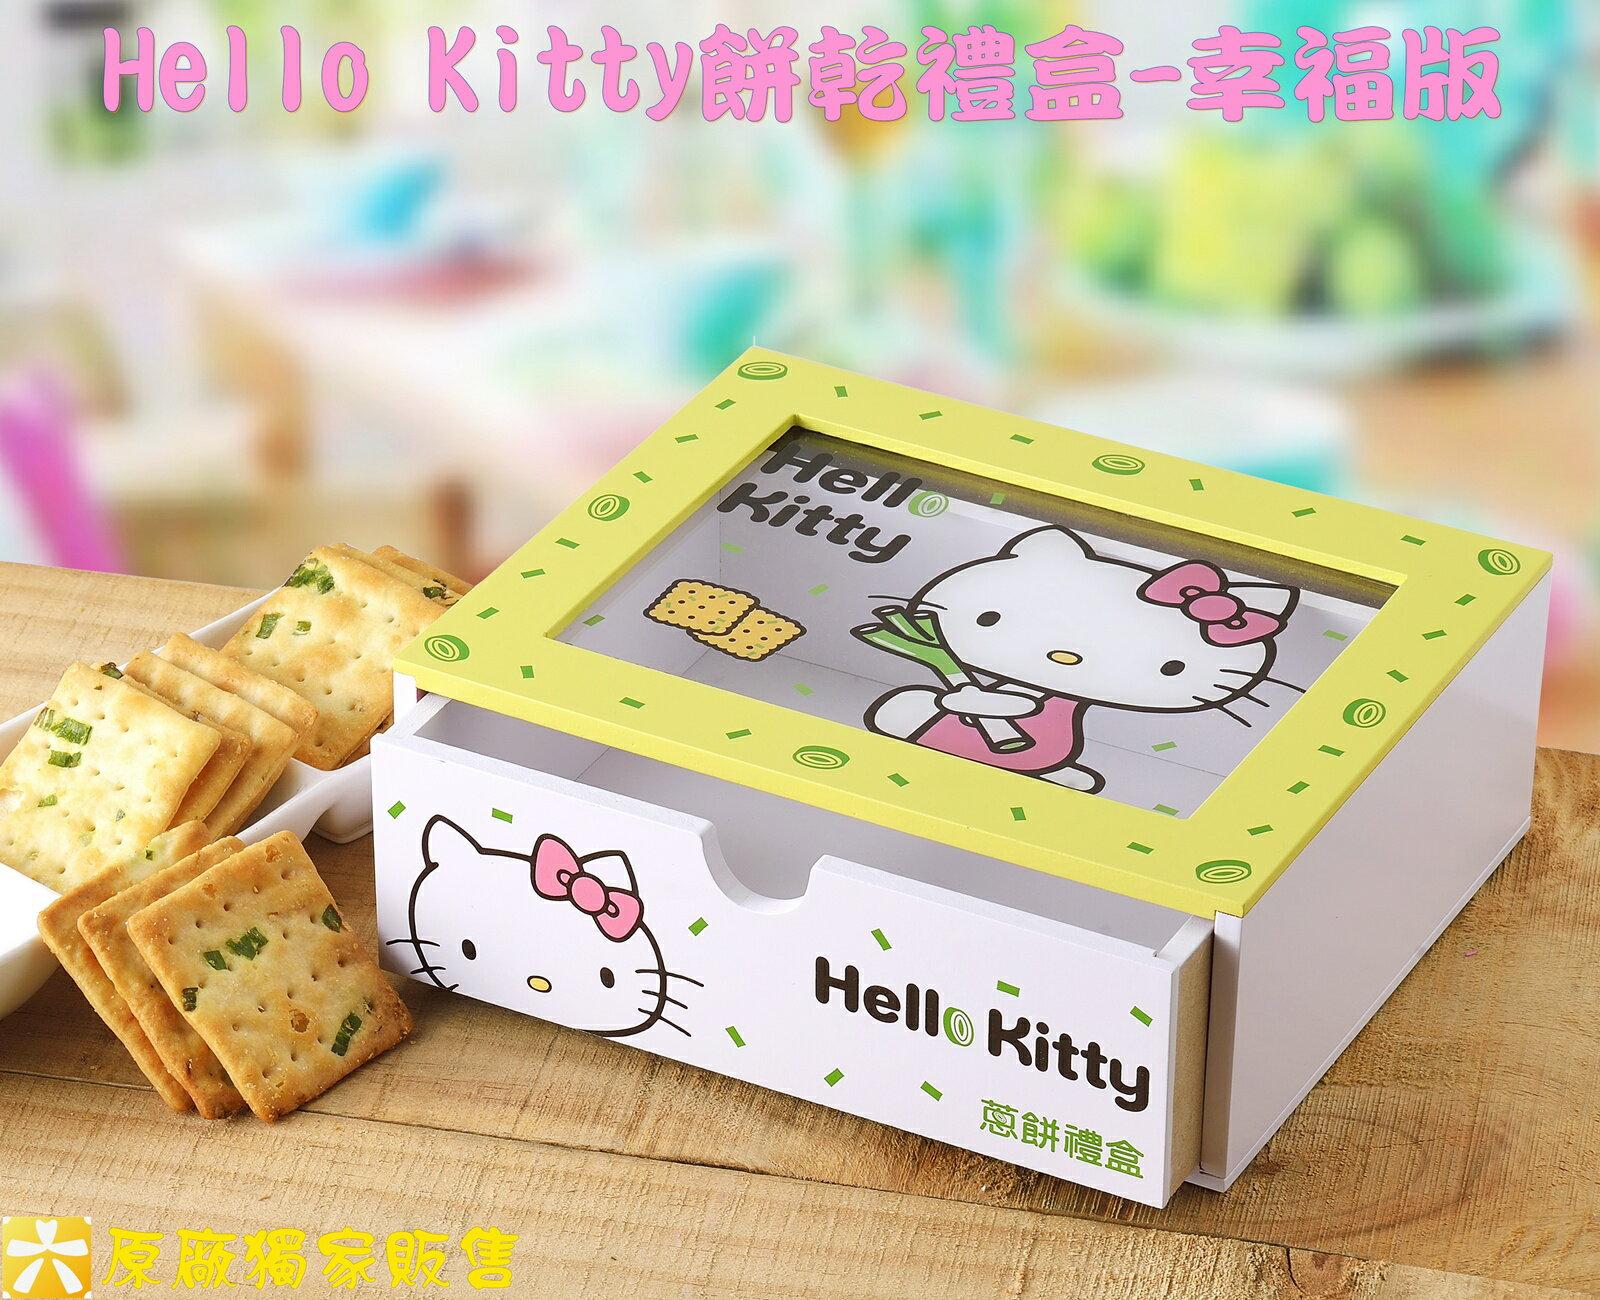 Hello Kitty 凱蒂貓 蔥餅禮盒-歡樂版 青綠木盒 禮盒 原廠獨家生產販售